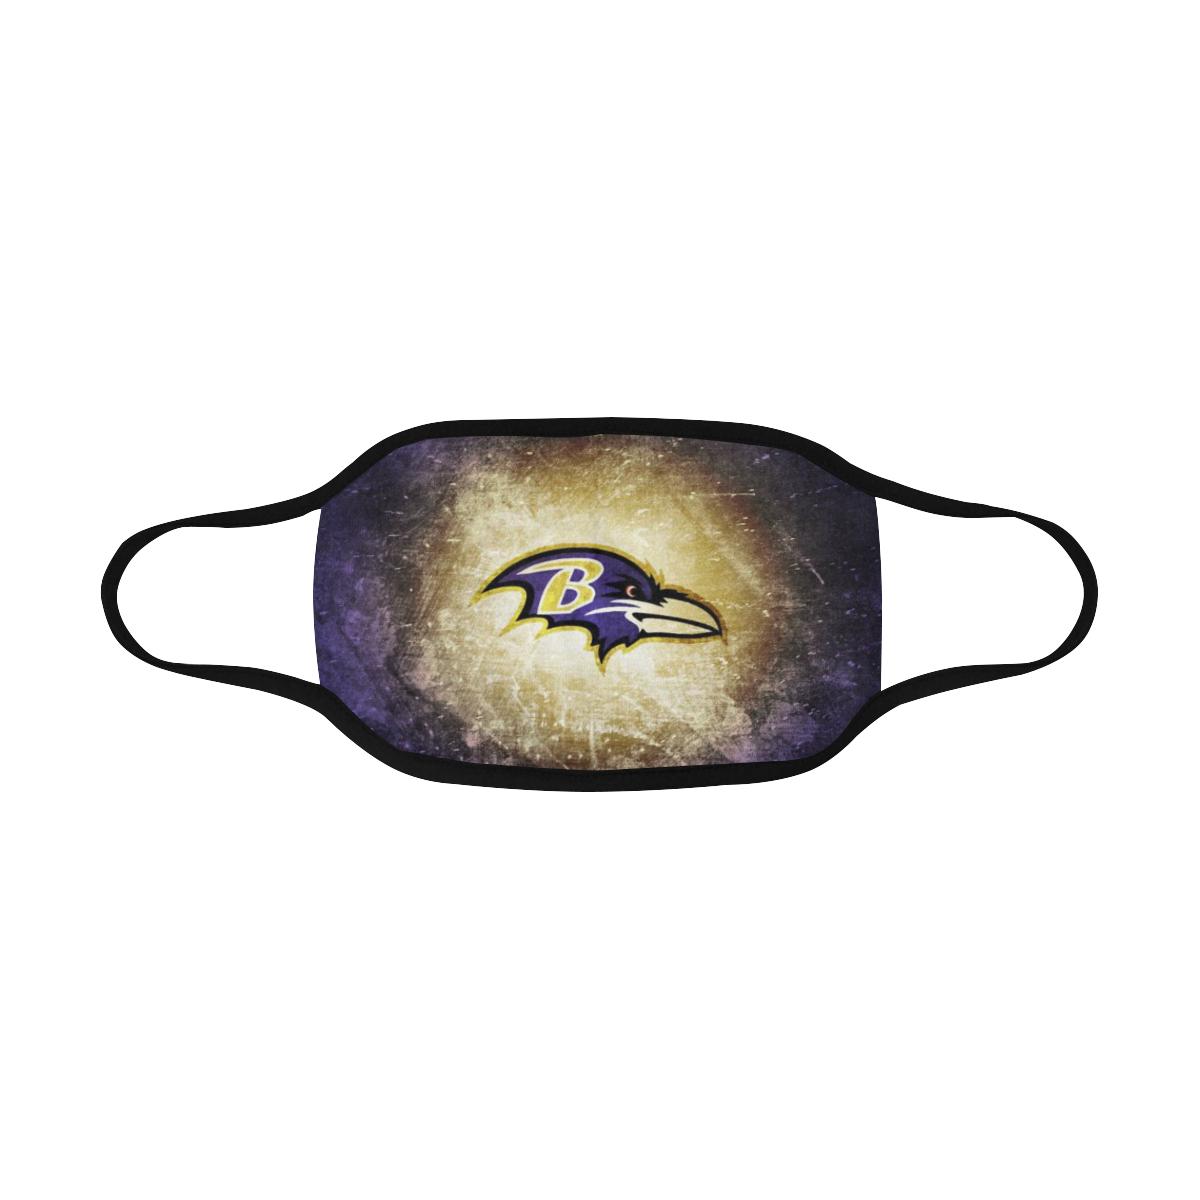 Baltimore Ravens Face Mask - Adults Mask PM2.5